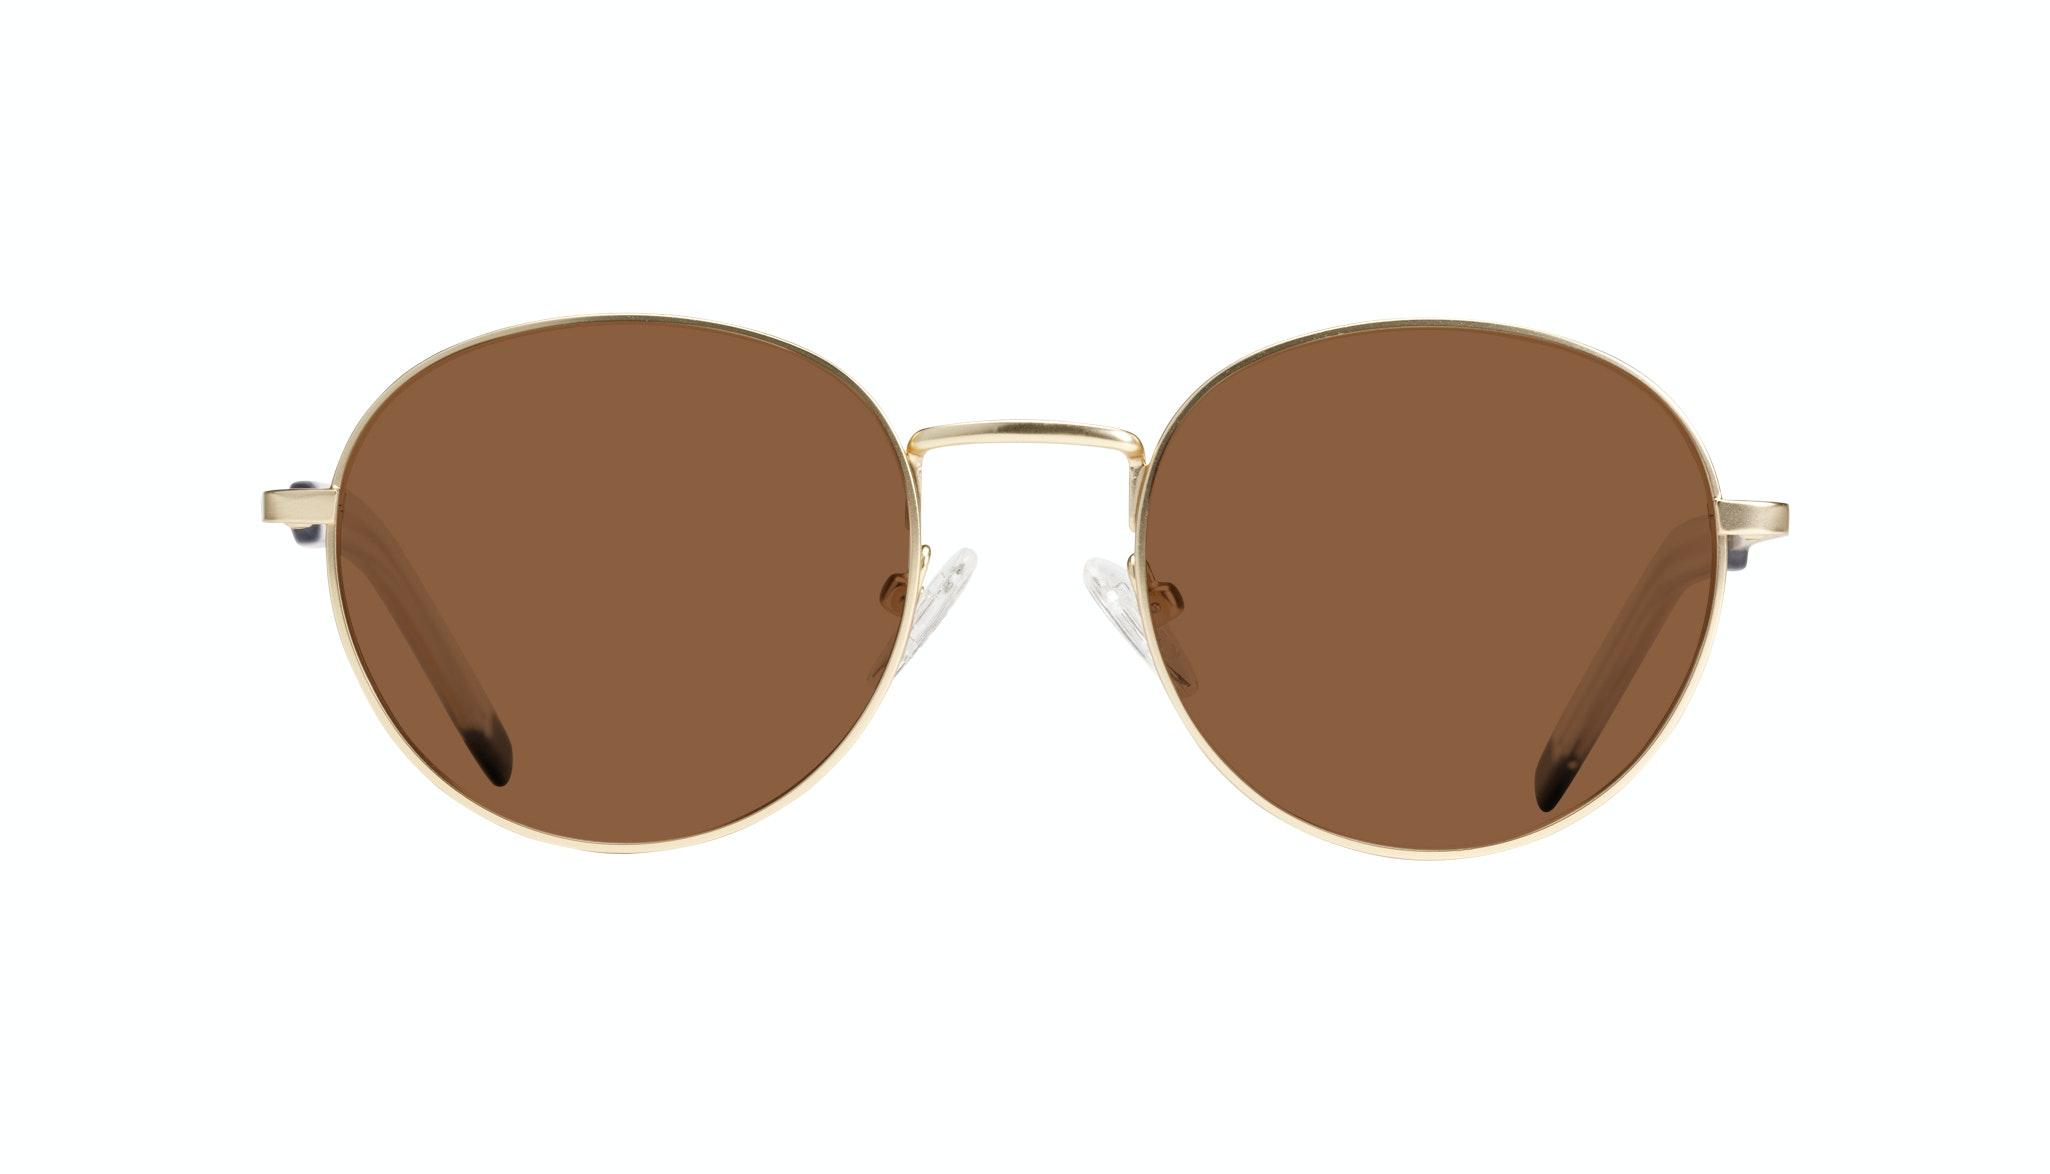 Affordable Fashion Glasses Round Sunglasses Men Lean Gold Matte